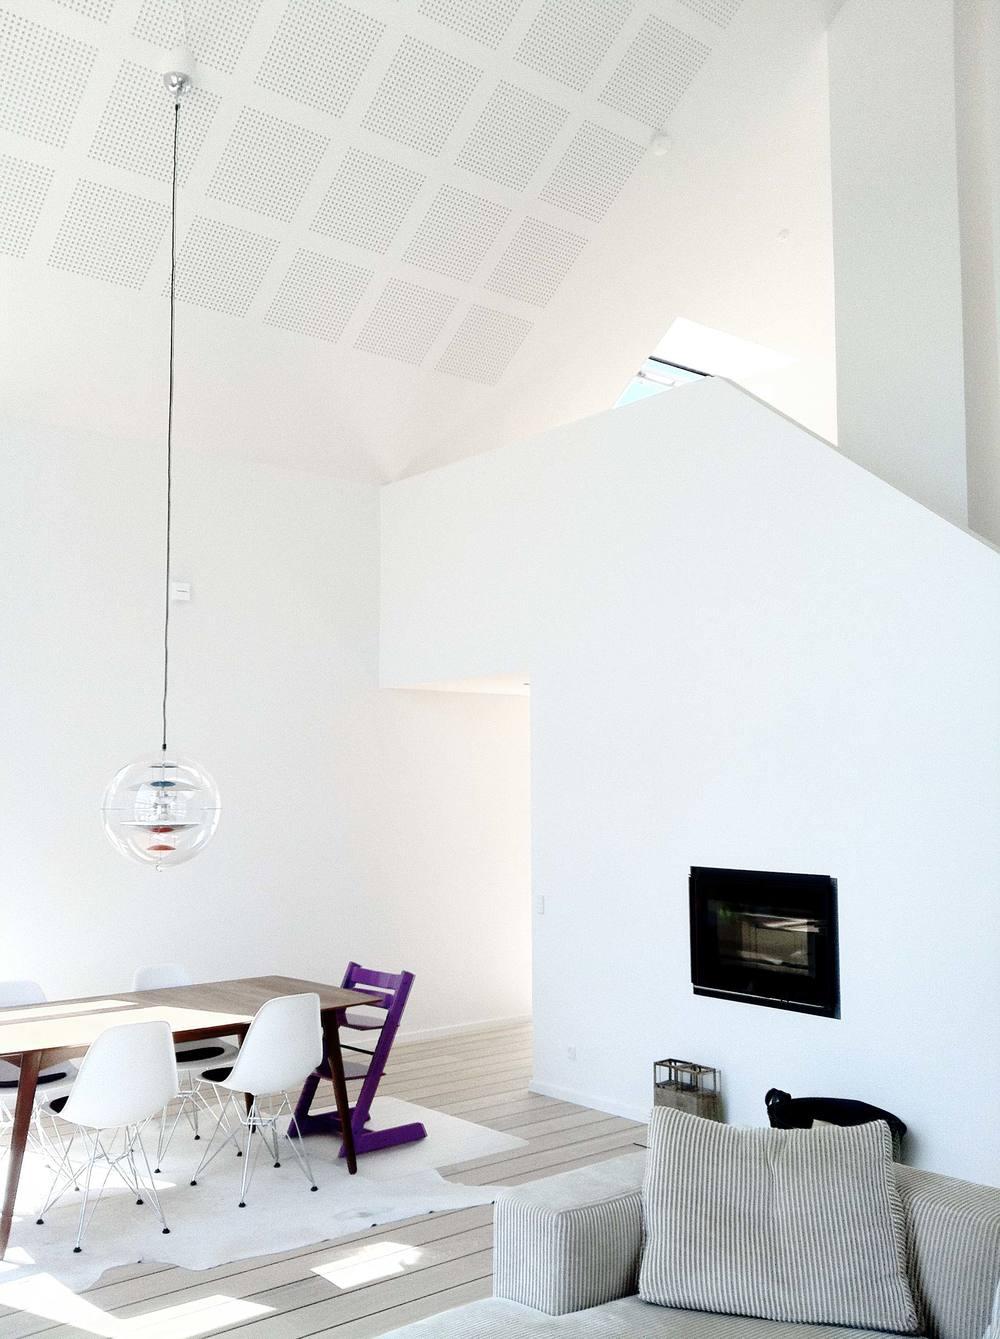 oneroom_arkitekttegnet_in_12.jpg